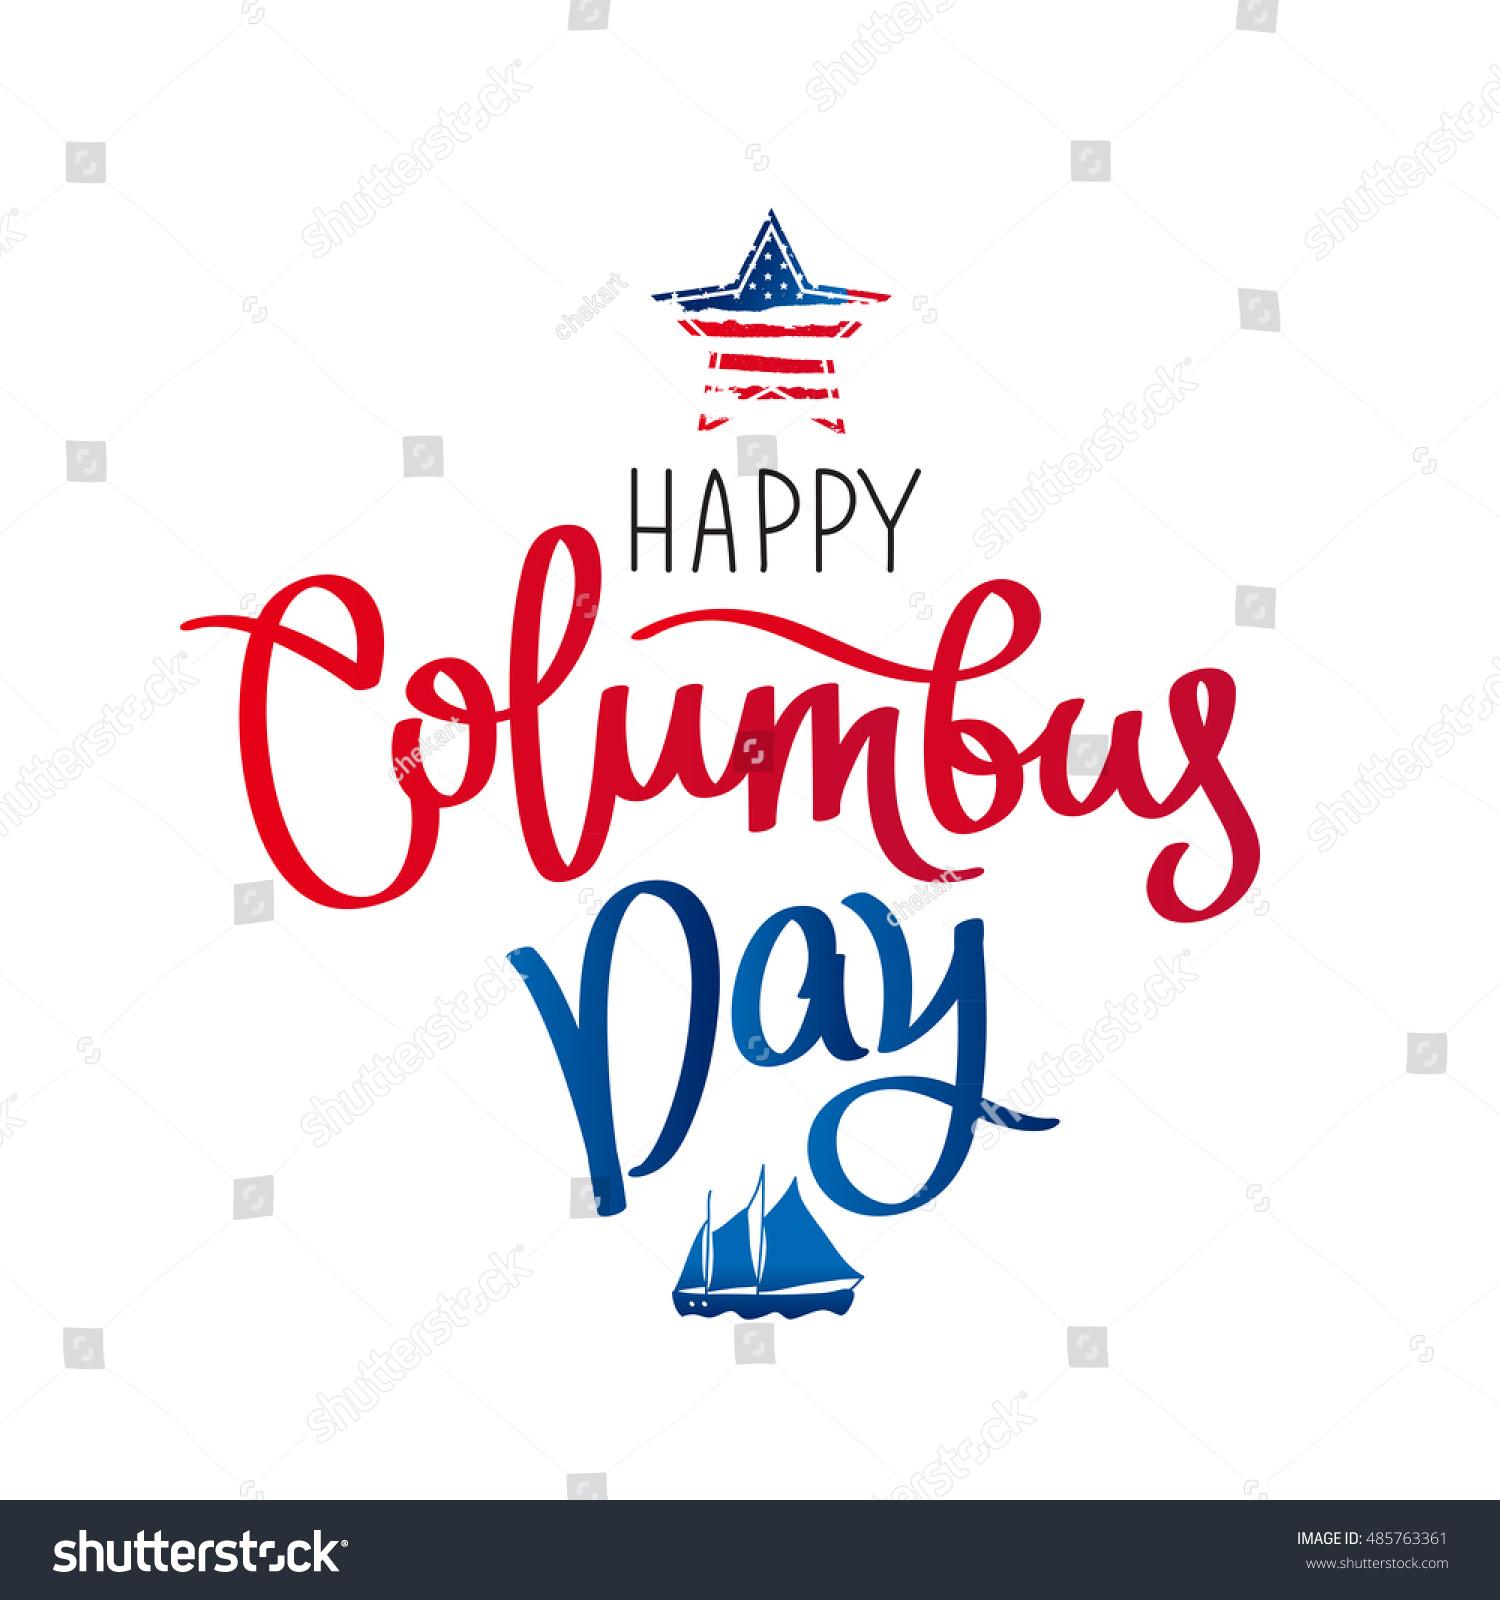 Happy Columbus Day Trend Calligraphy Vector Stock Vector